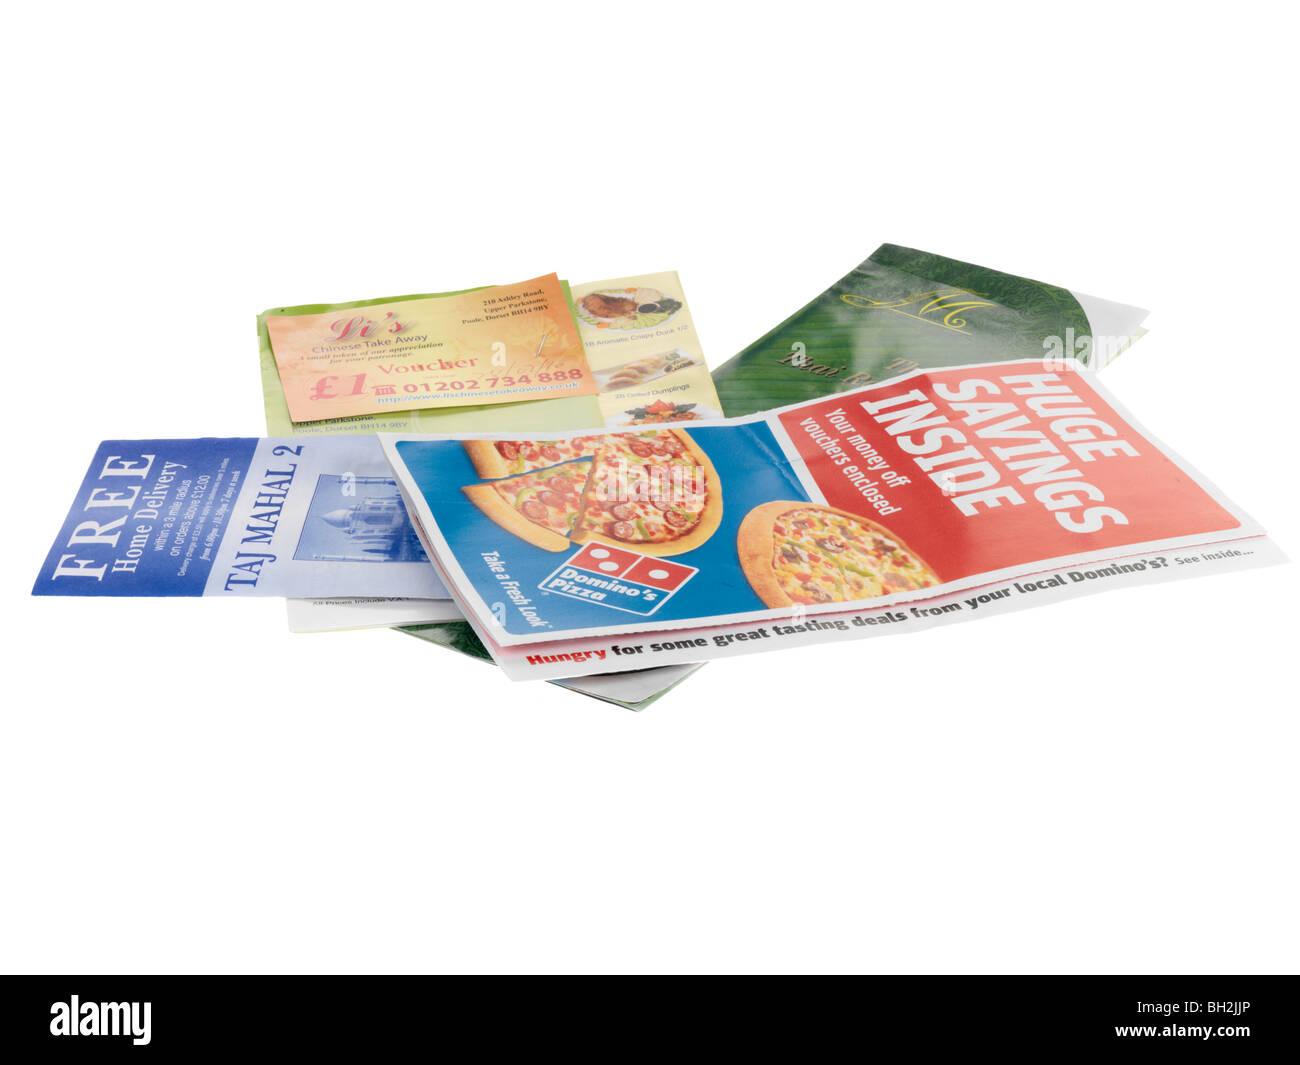 Takeaway Menus - Stock Image